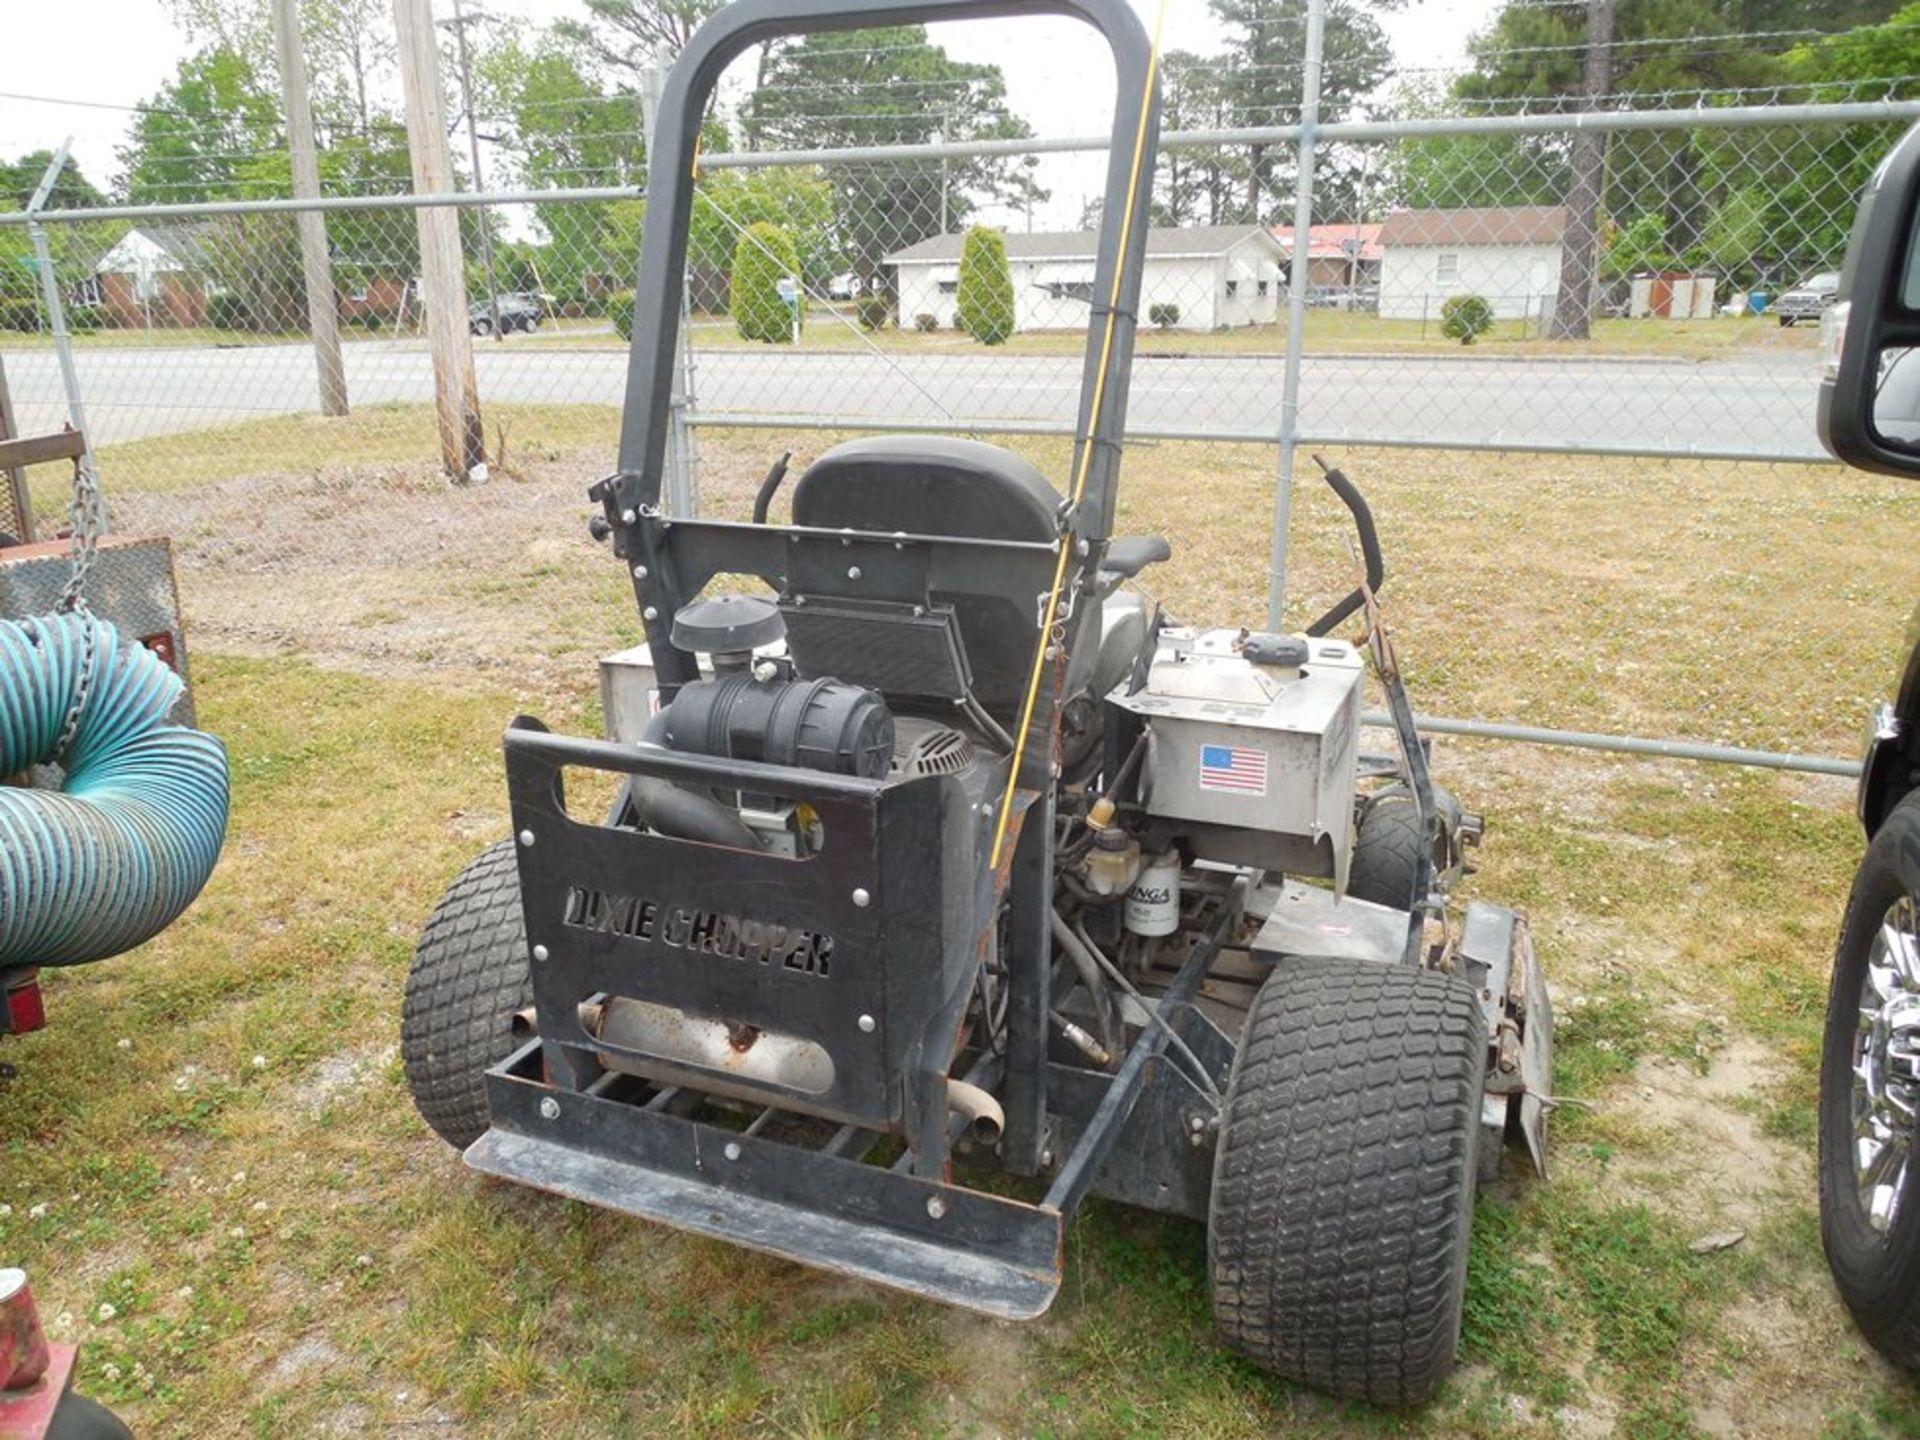 "Dixie Chopper 72"" zero-turn lawn mower Kohler engine 887 hrs showing - Image 3 of 4"